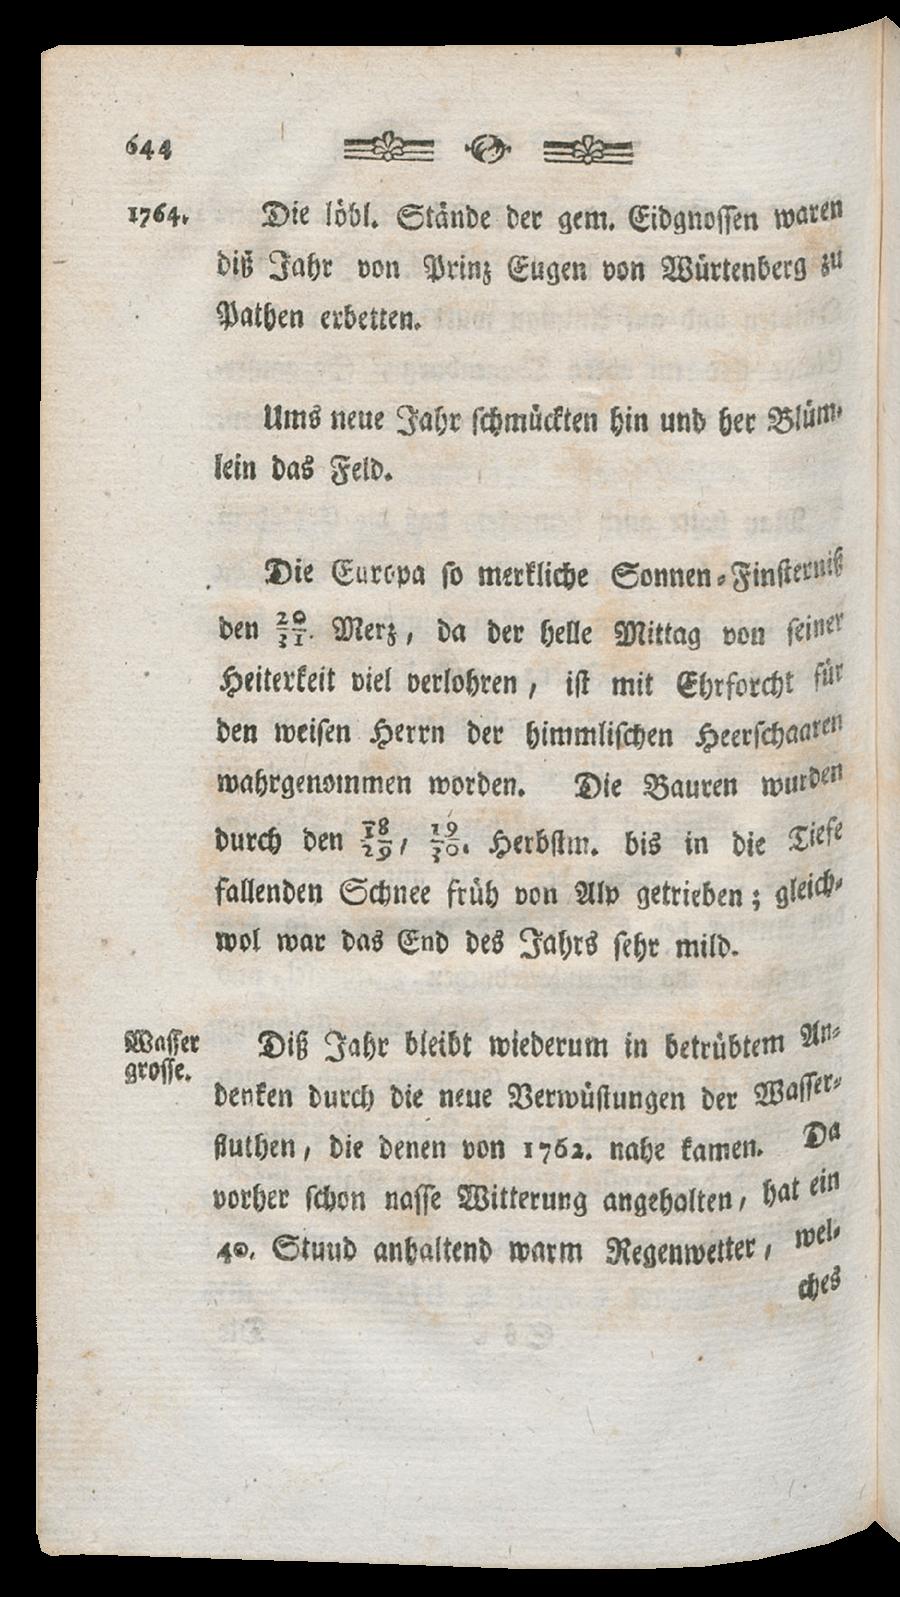 1764_1774_TrÅmpi_Glarner-Chronick_644-646-1